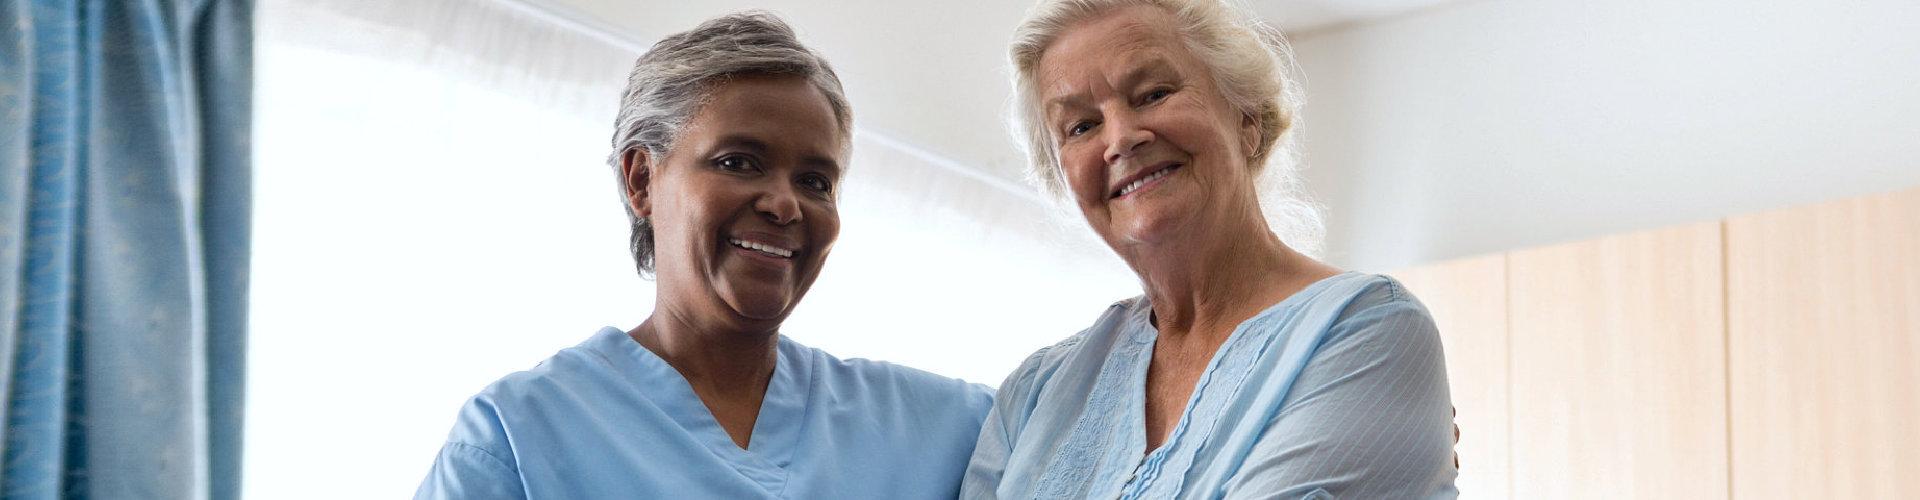 two ladies smiling